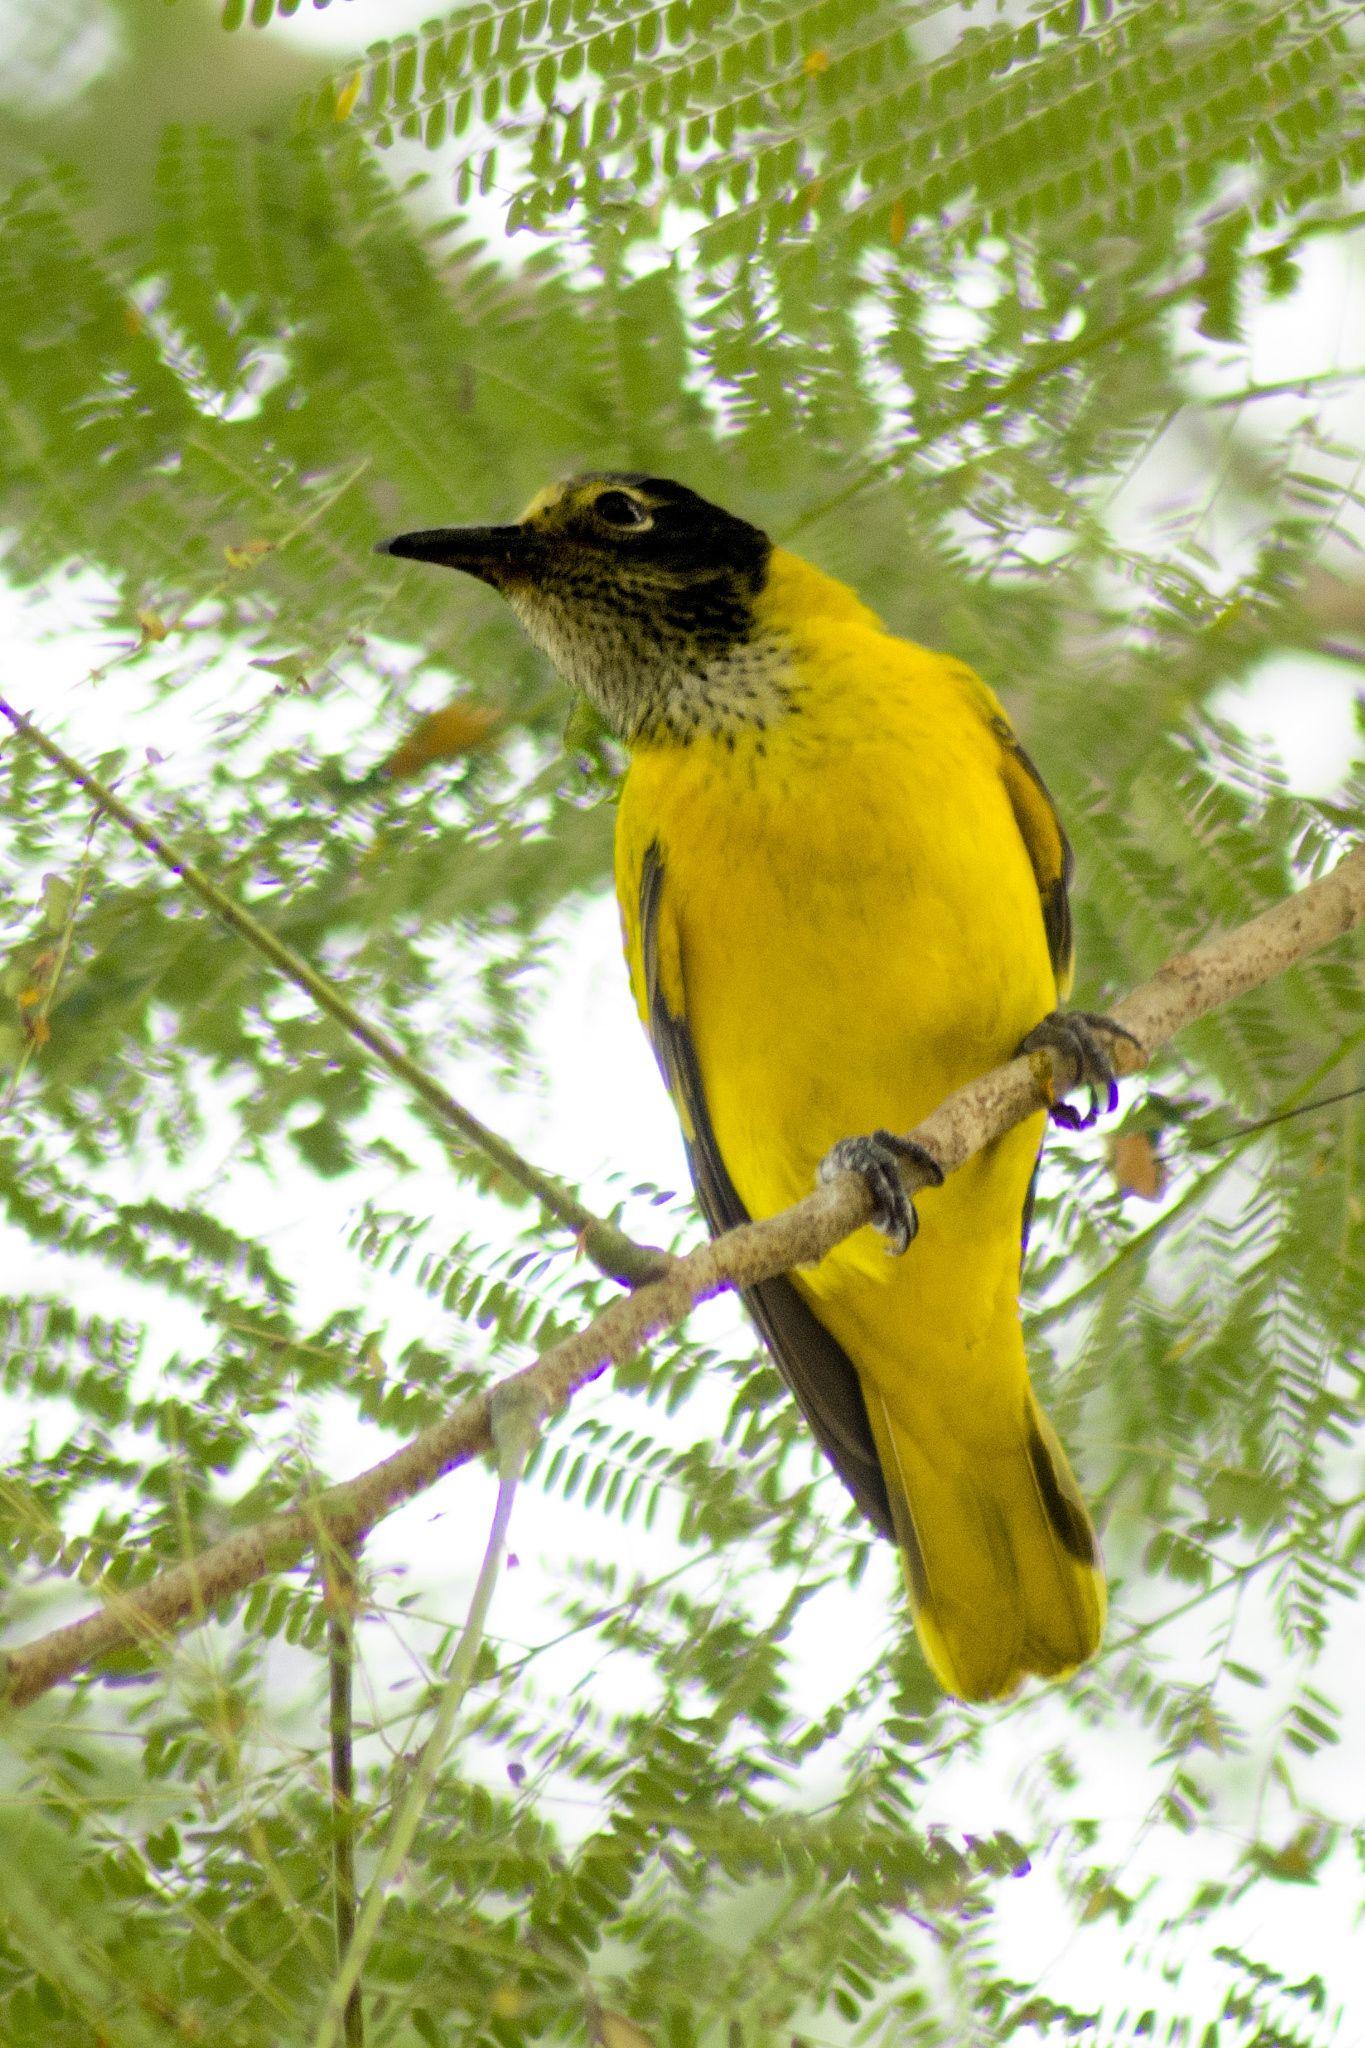 Black headed Golden Oriole bird nature animals yellow green